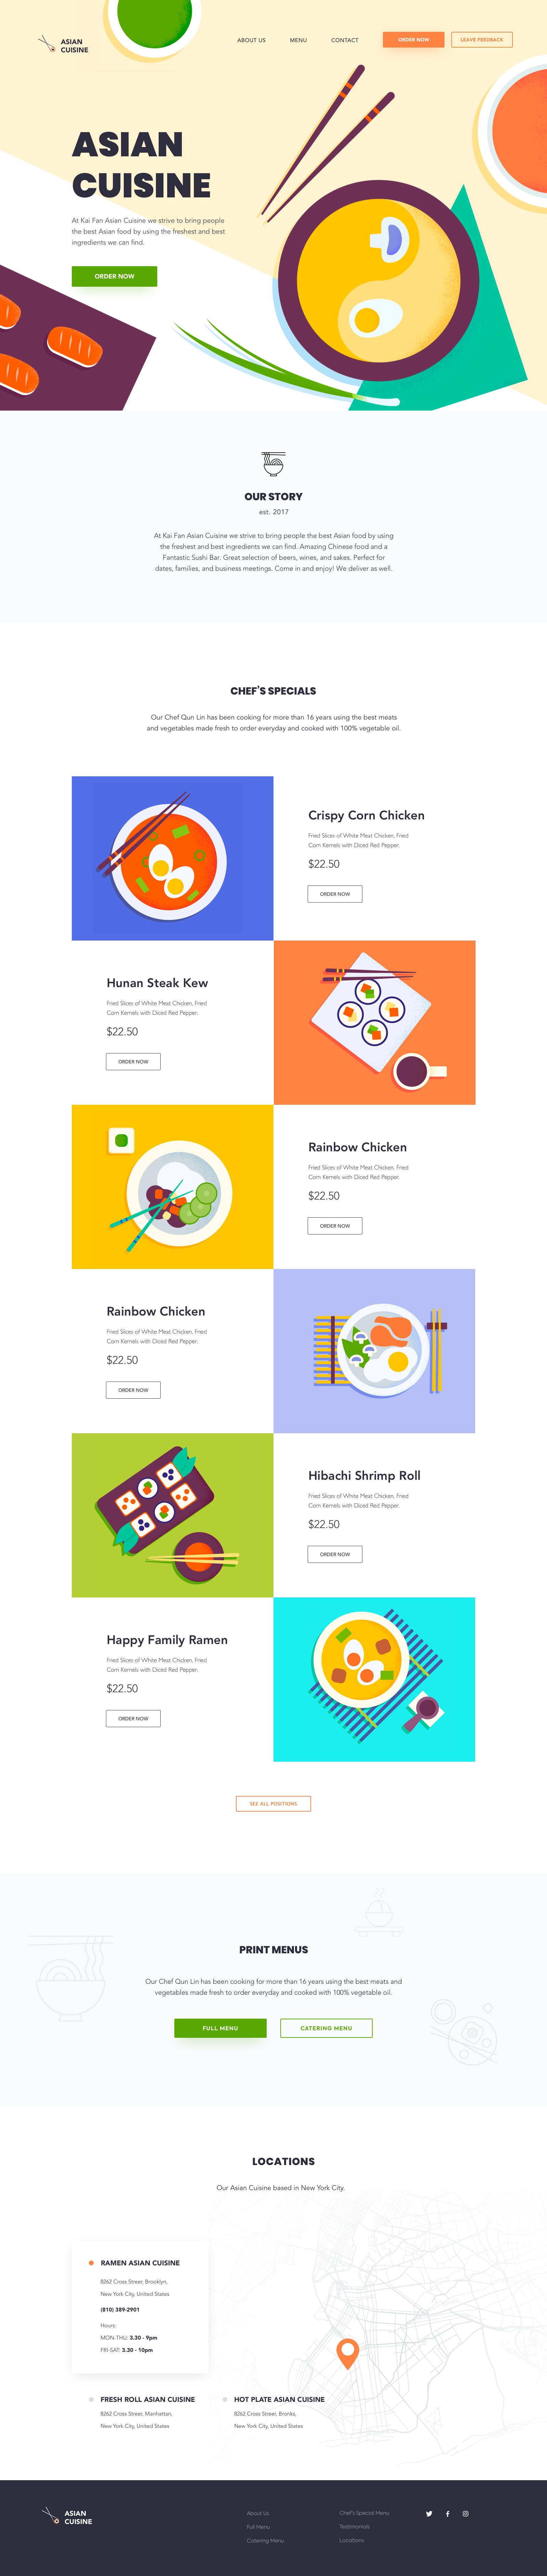 Landing Page Asian Cuisine Best Landing Page Design Web Design Landing Page